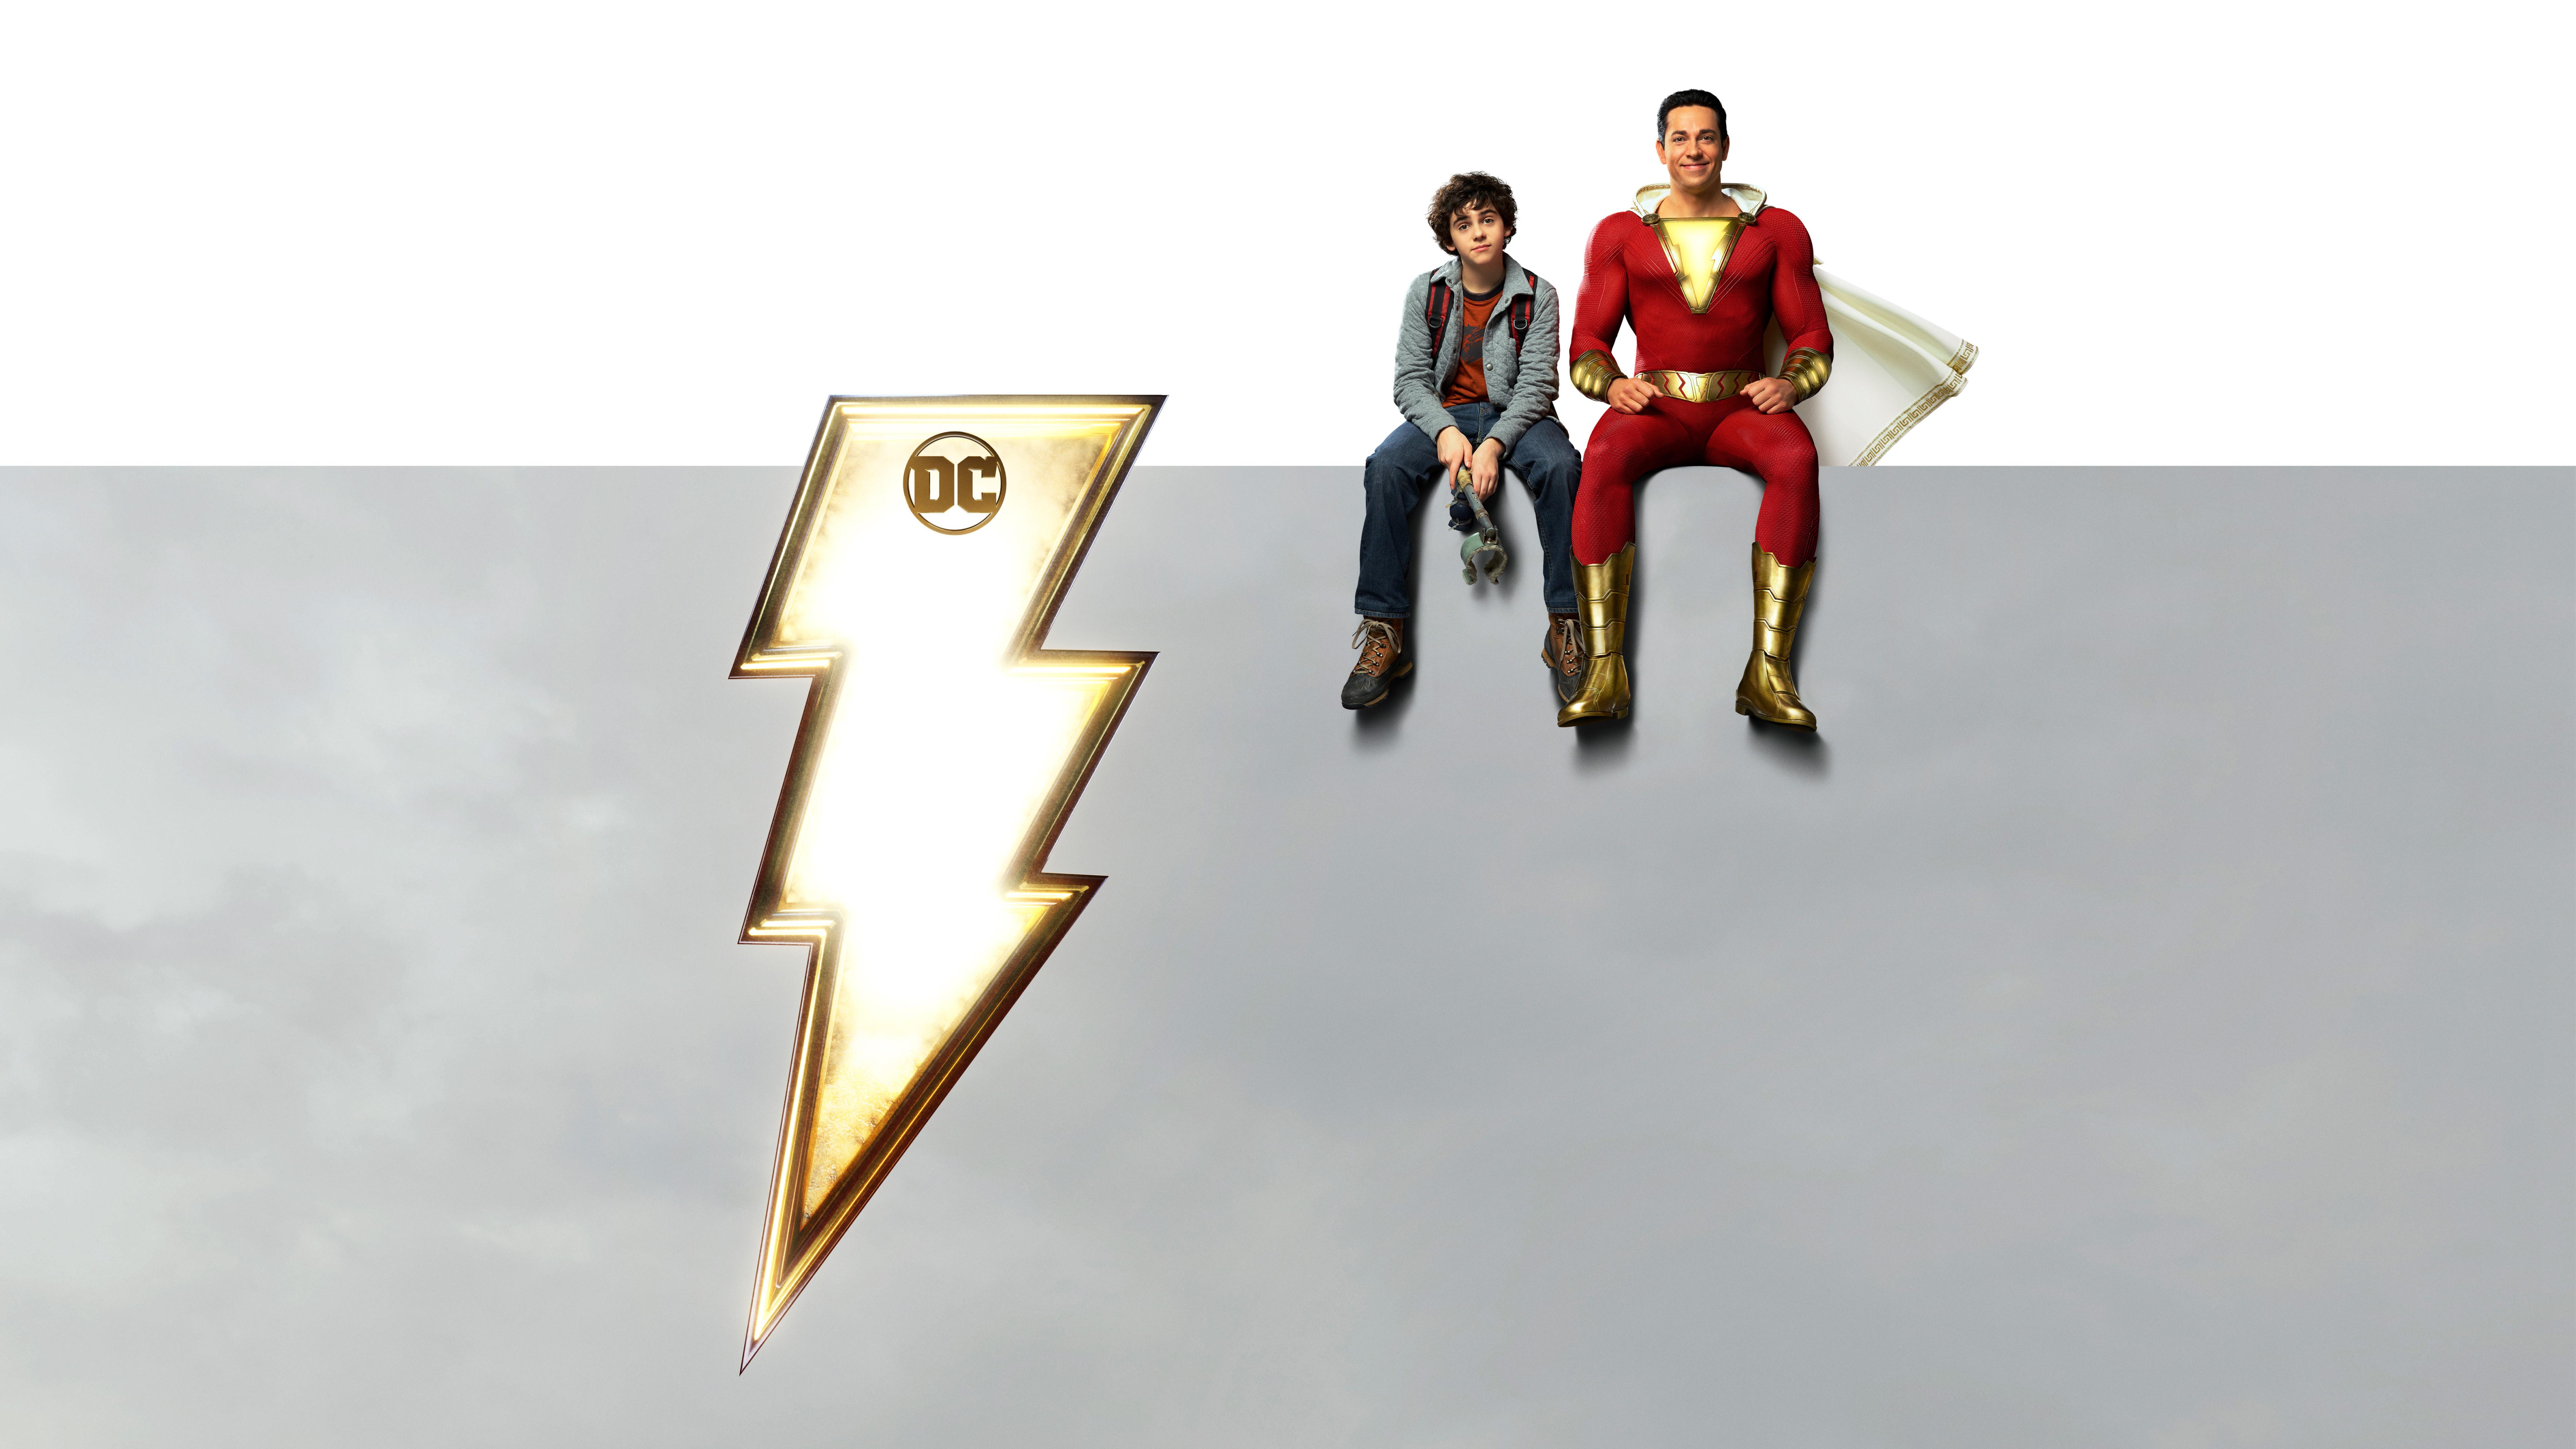 7680x4320 Shazam Movie 8k 8k Wallpaper Hd Movies 4k